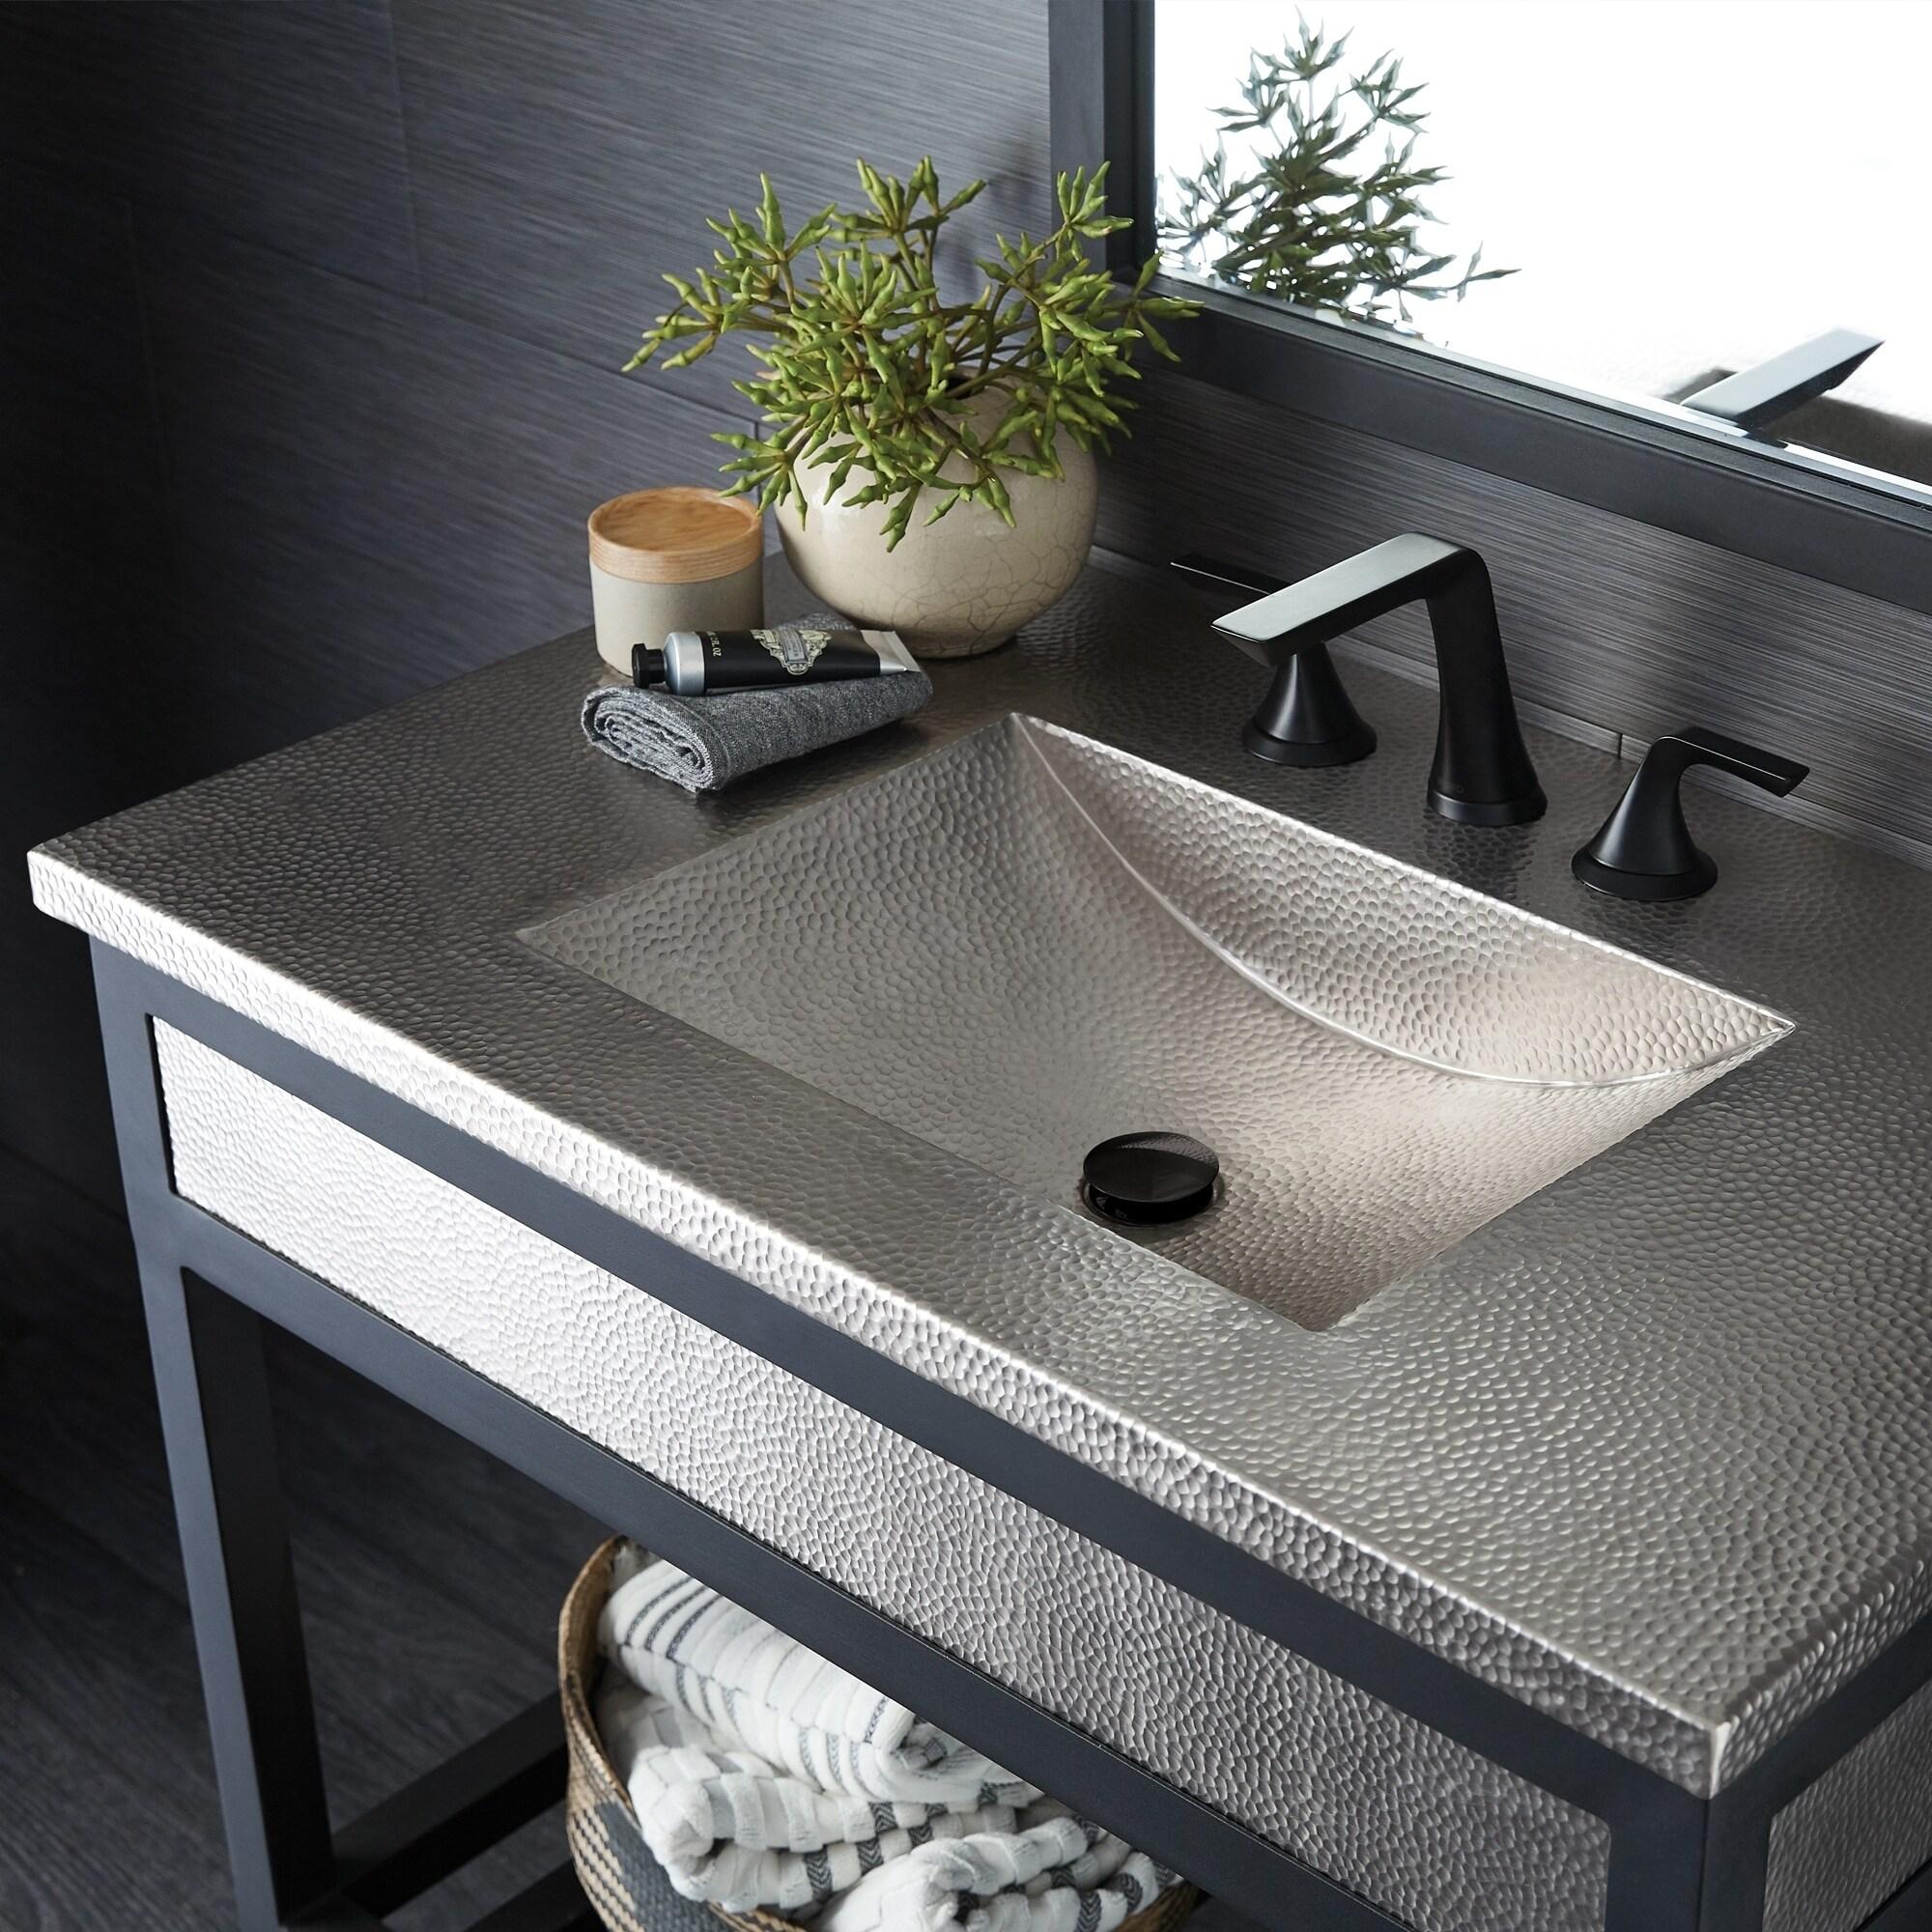 Cozumel Vanity Top With Integral Bathroom Sink In Brushed Nickel Top Only Overstock 27617916 30 5 X 21 75 X 4 5 30 Inch